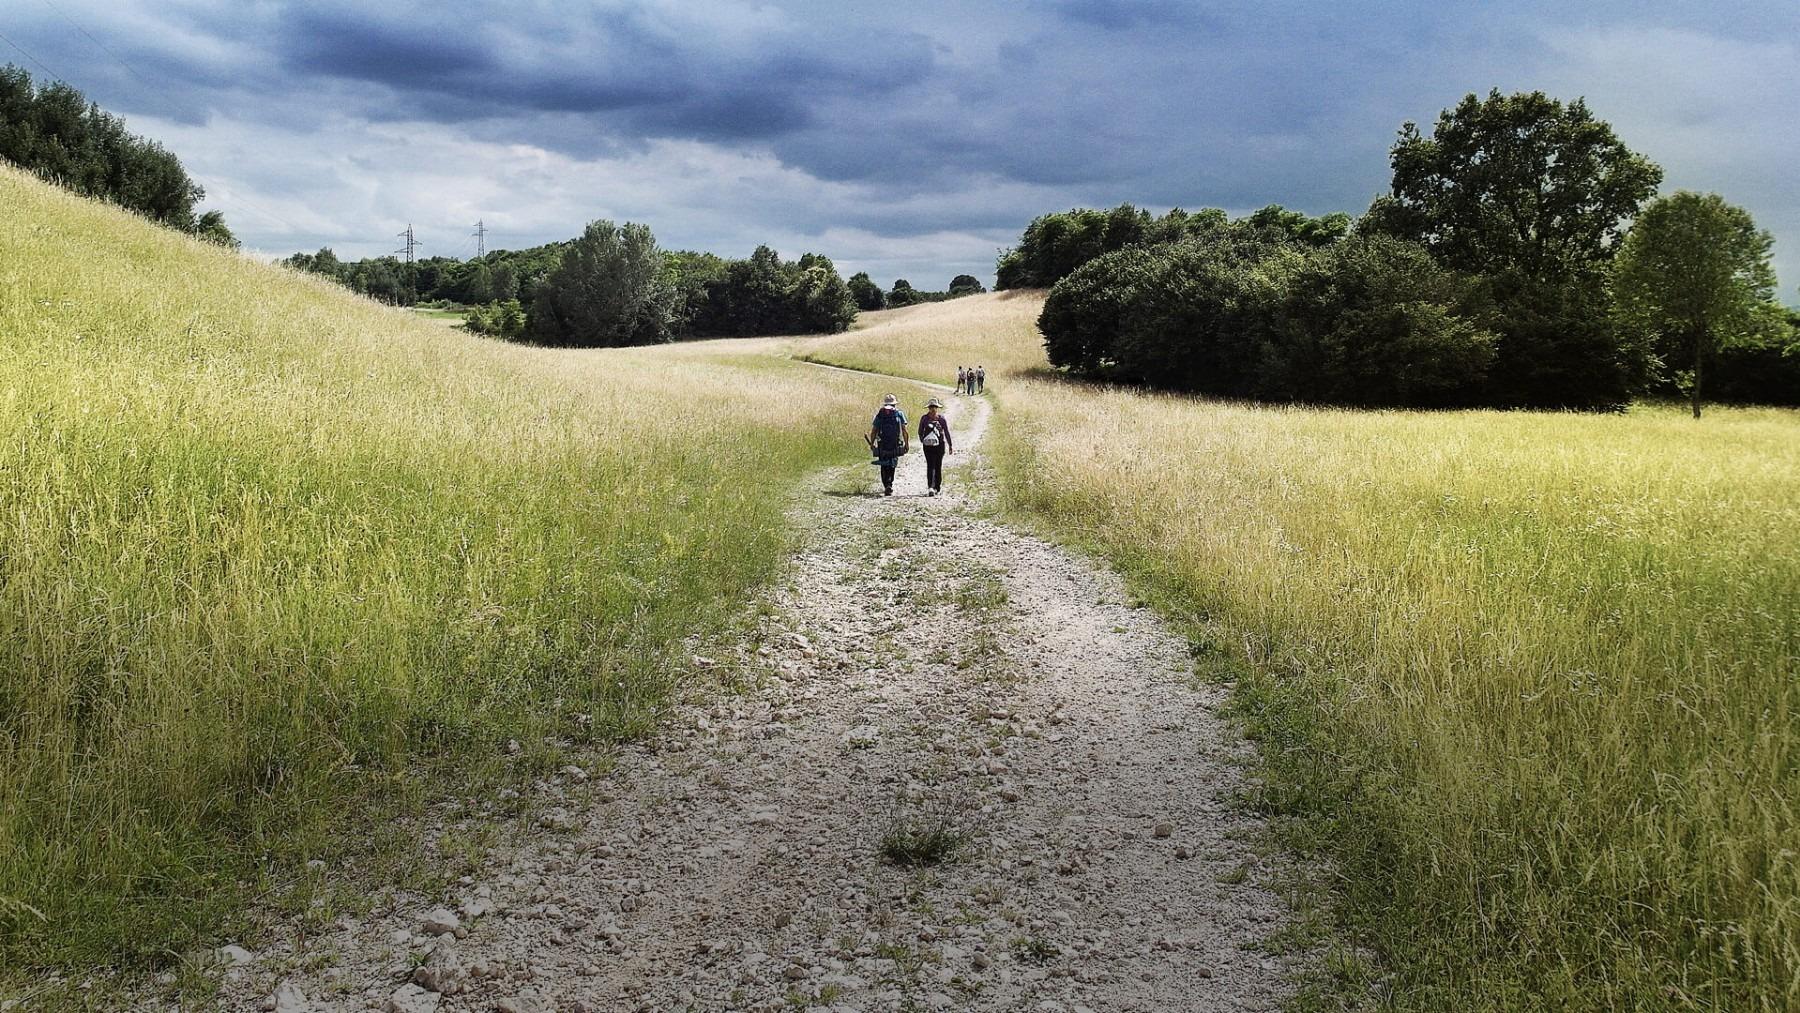 Cammino Celeste